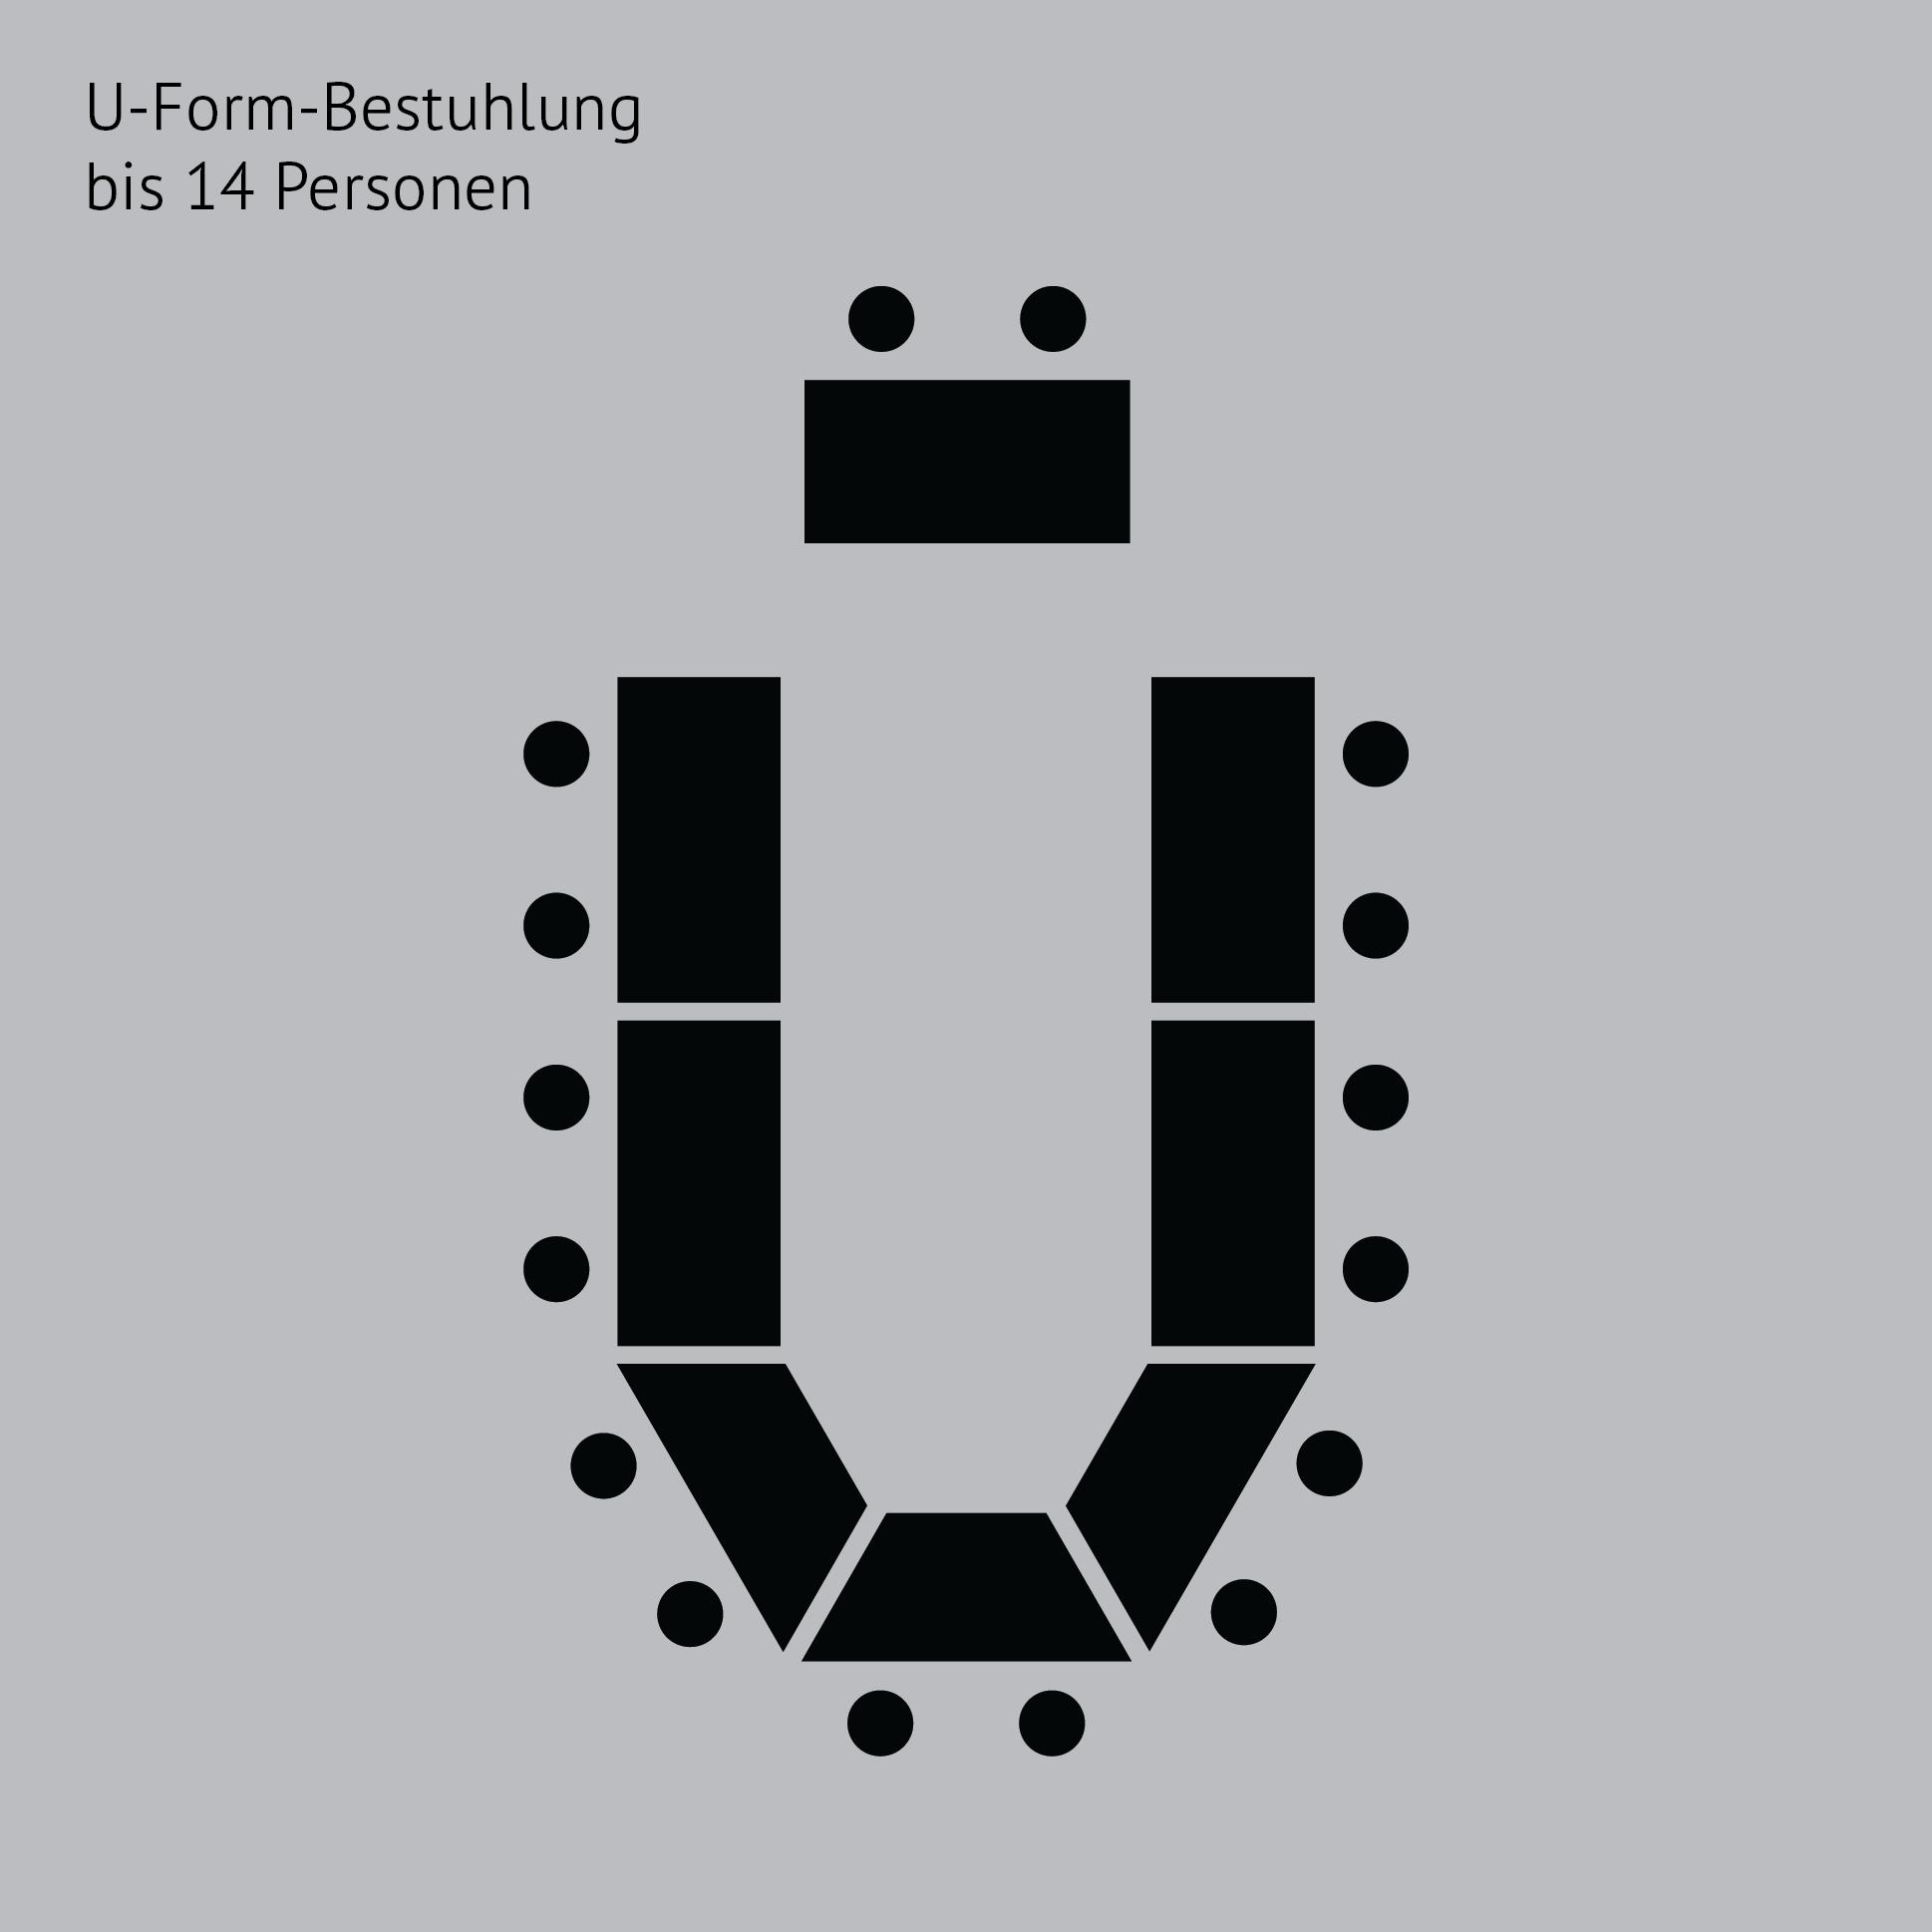 Seminarraum_Ebenalp-Kronberg_465x465px_U-Form